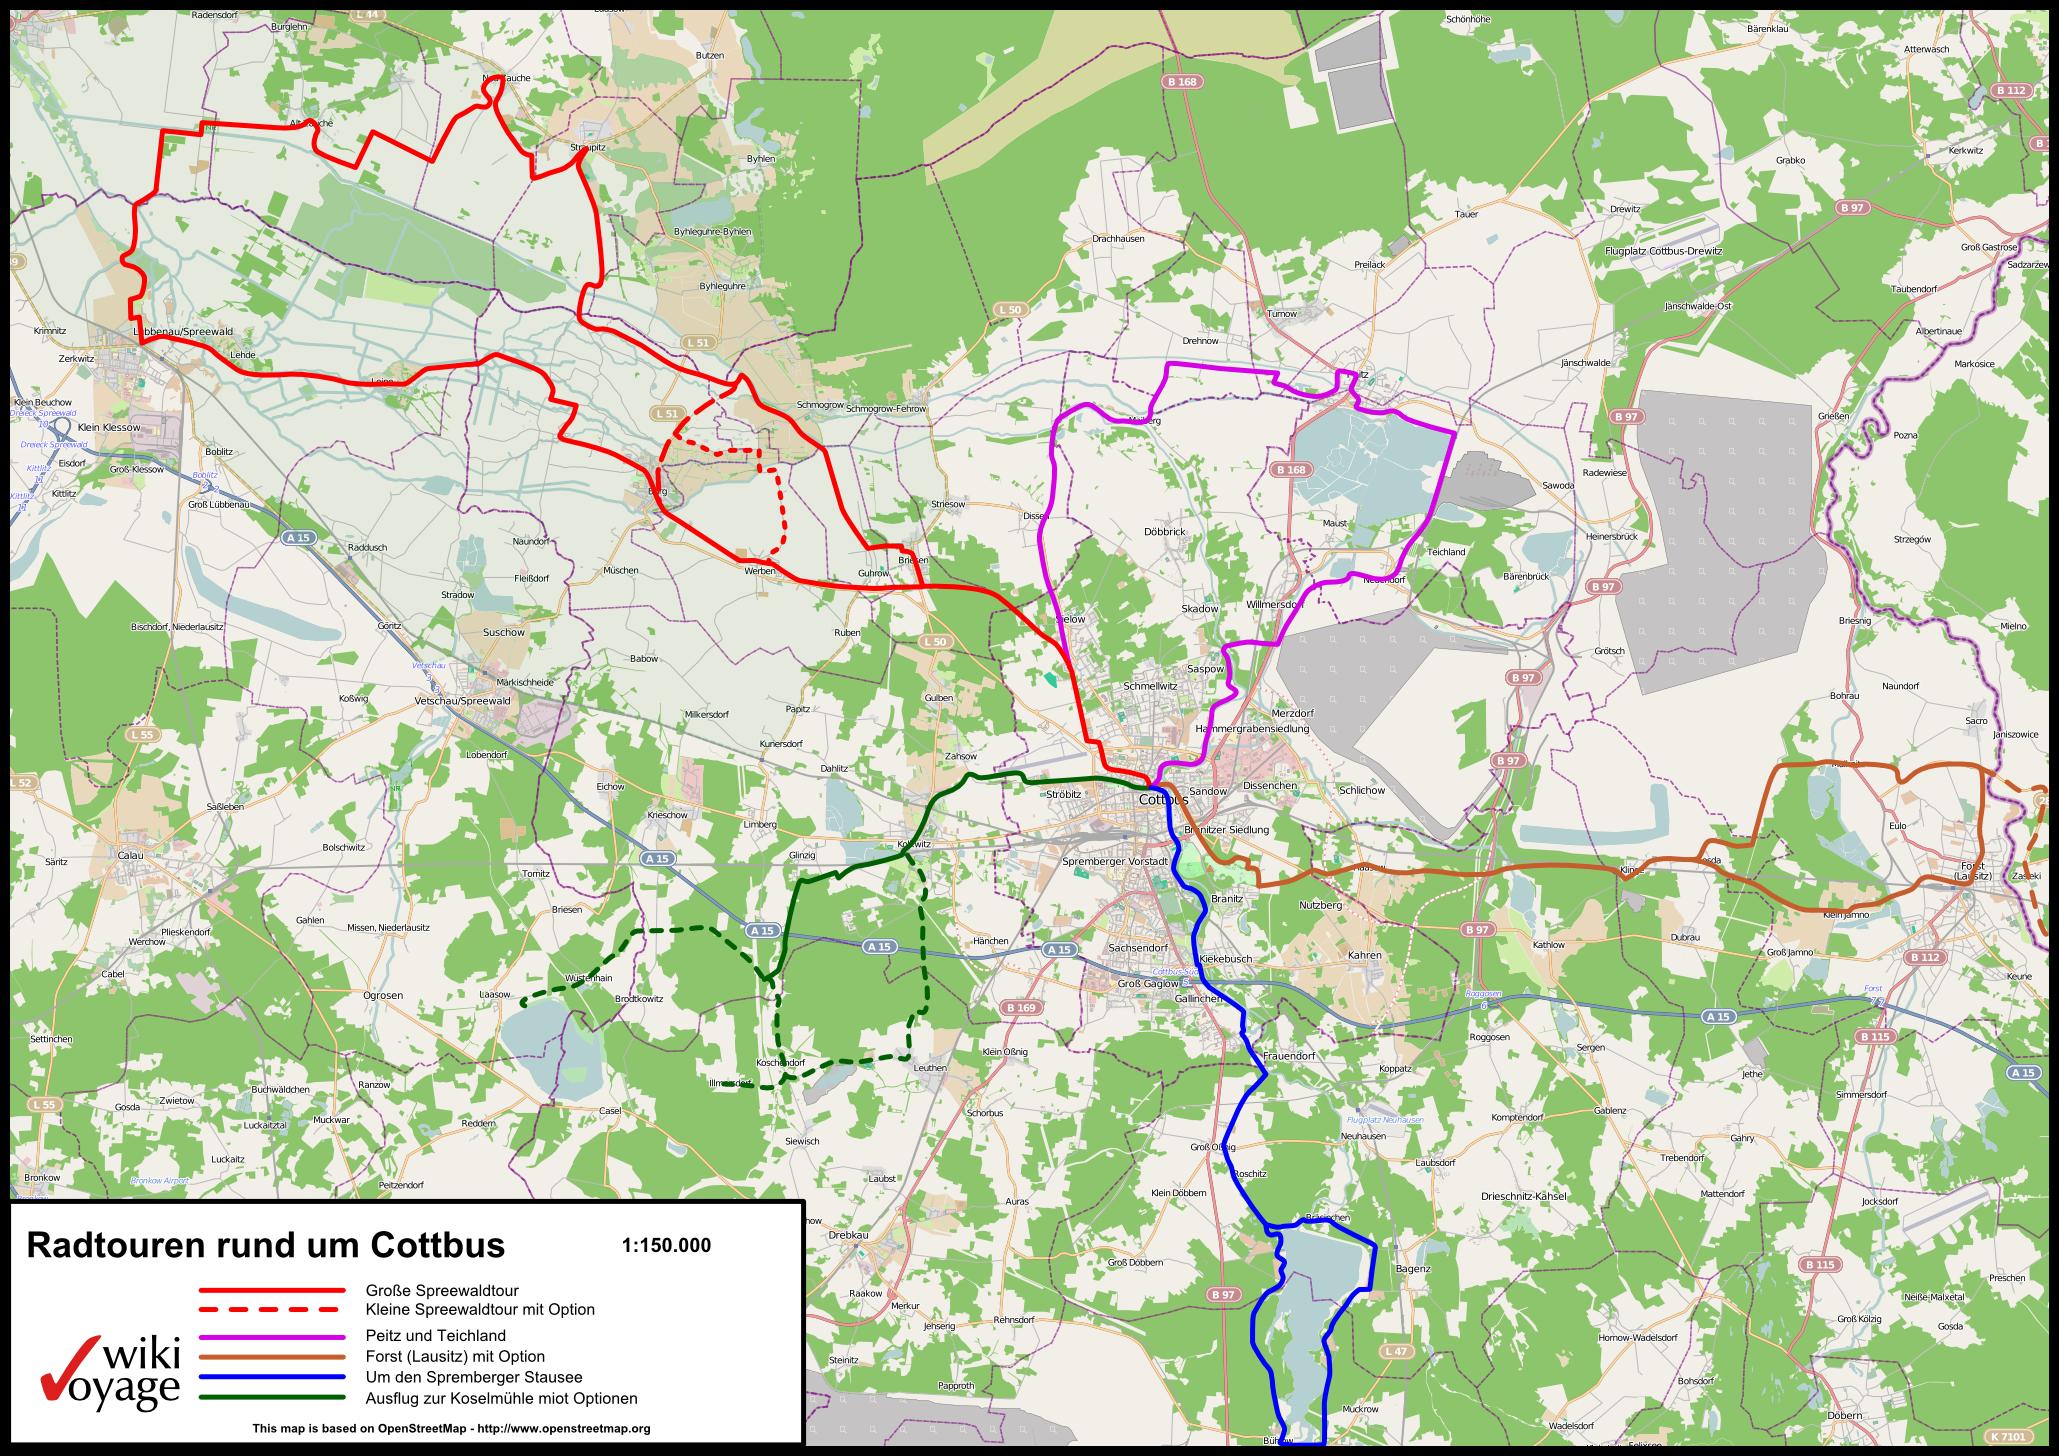 FileKarte Radtouren rund um Cottbuspng Wikimedia Commons